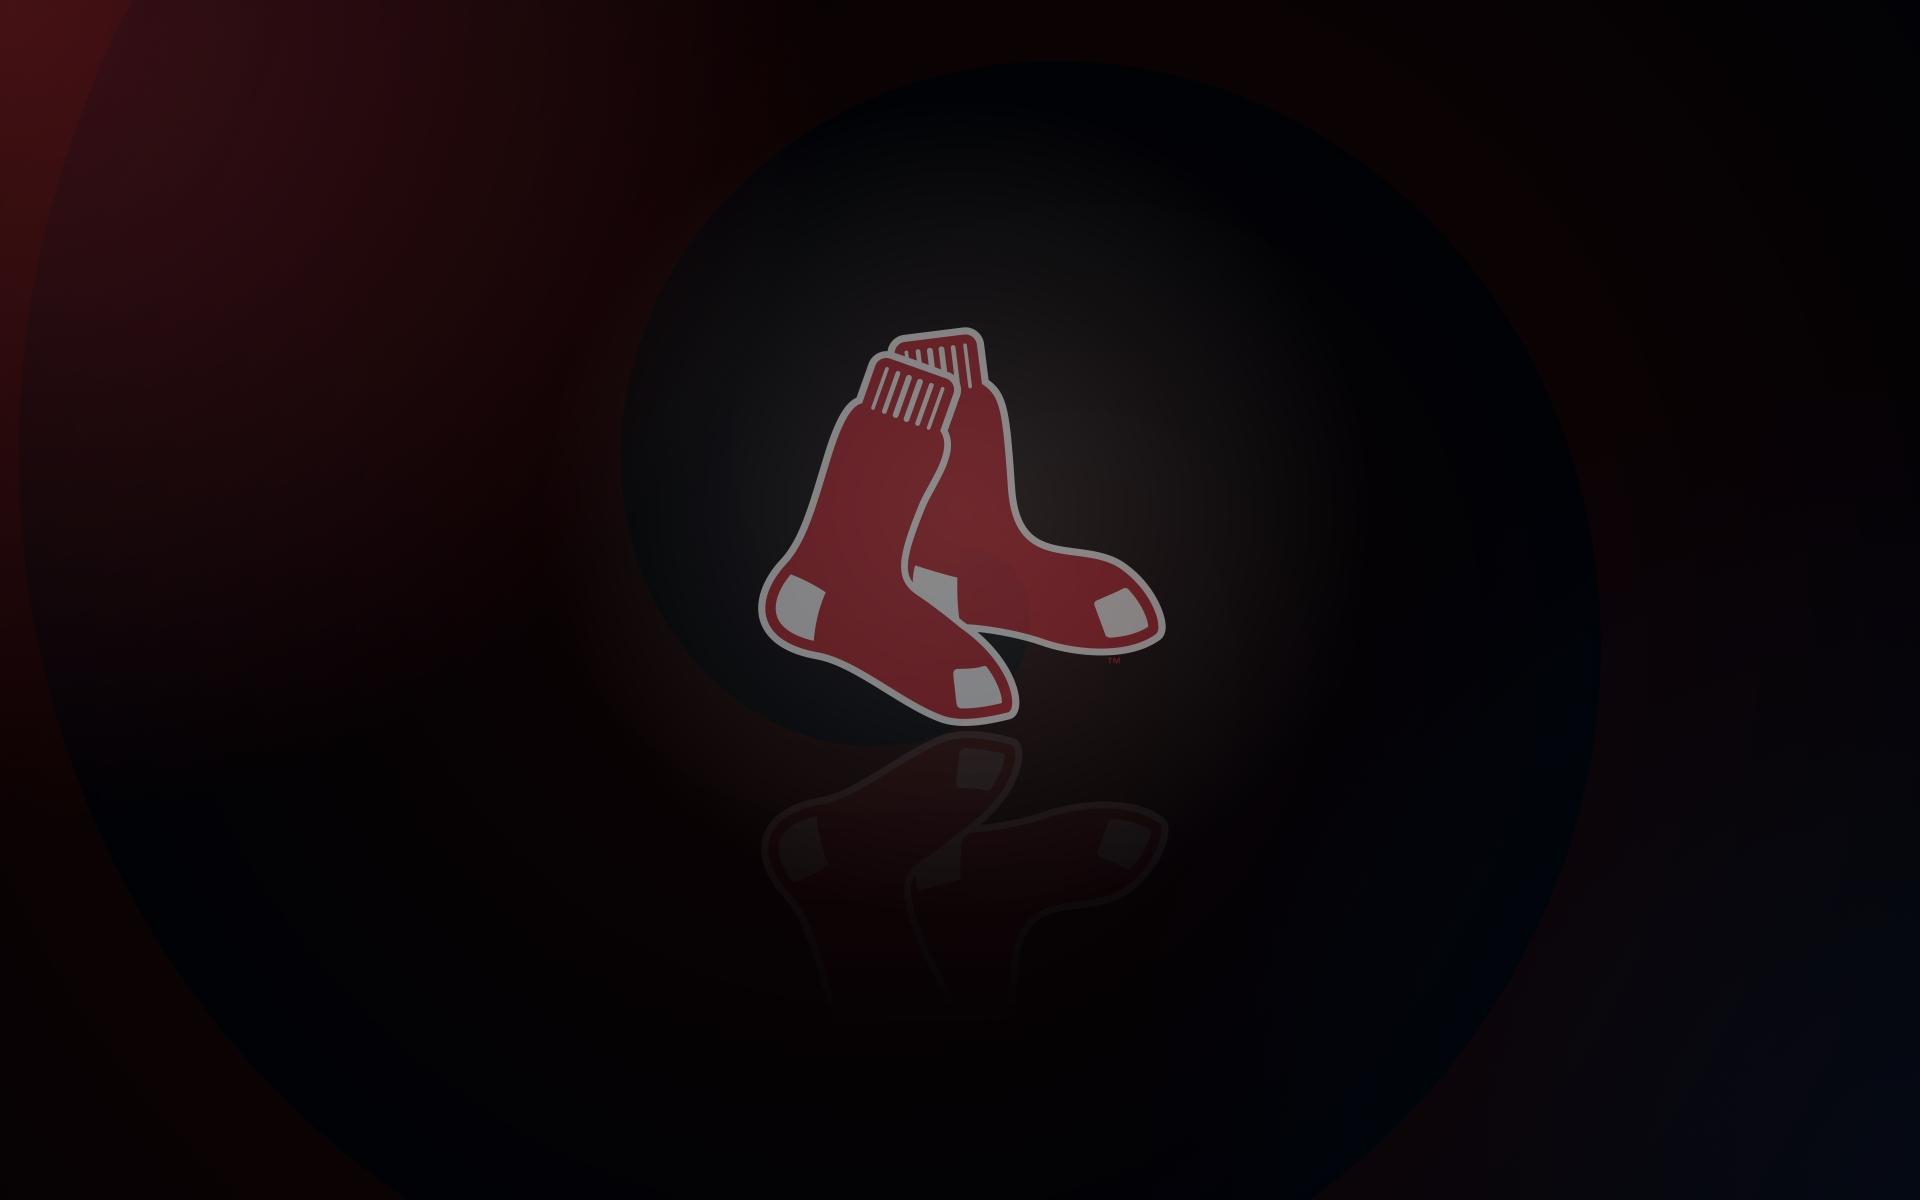 Boston Red Sox HD Wallpaper Background Image 1920x1200 ID 1920x1200